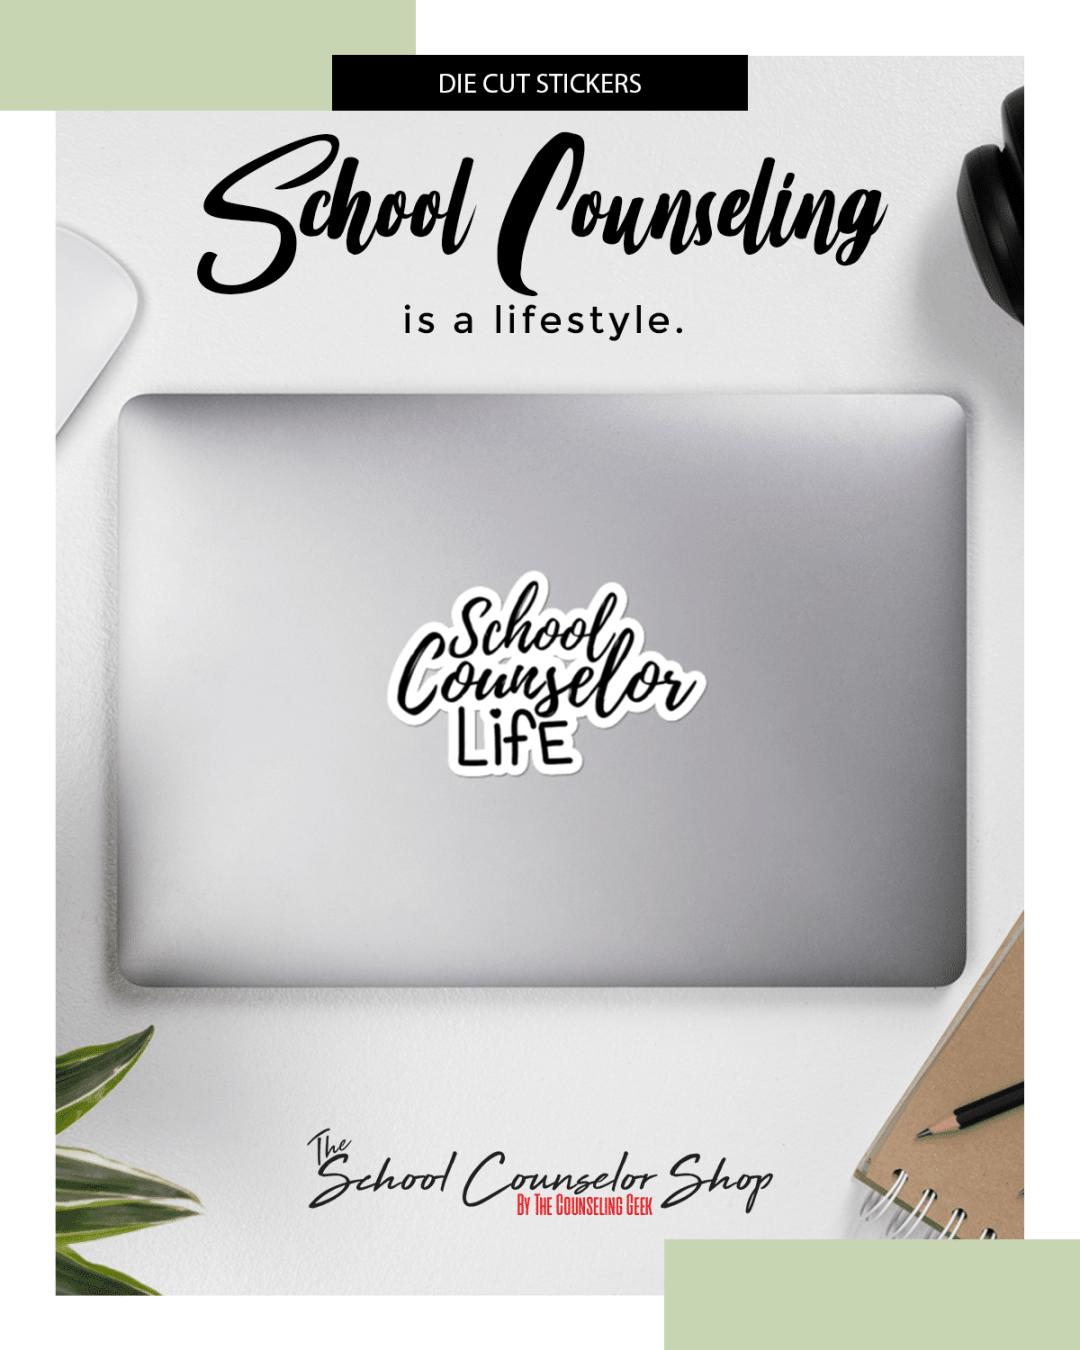 School Counselor   Counselor Sticker   Laptop Sticker  School Counselor Life Bubble-free stickers